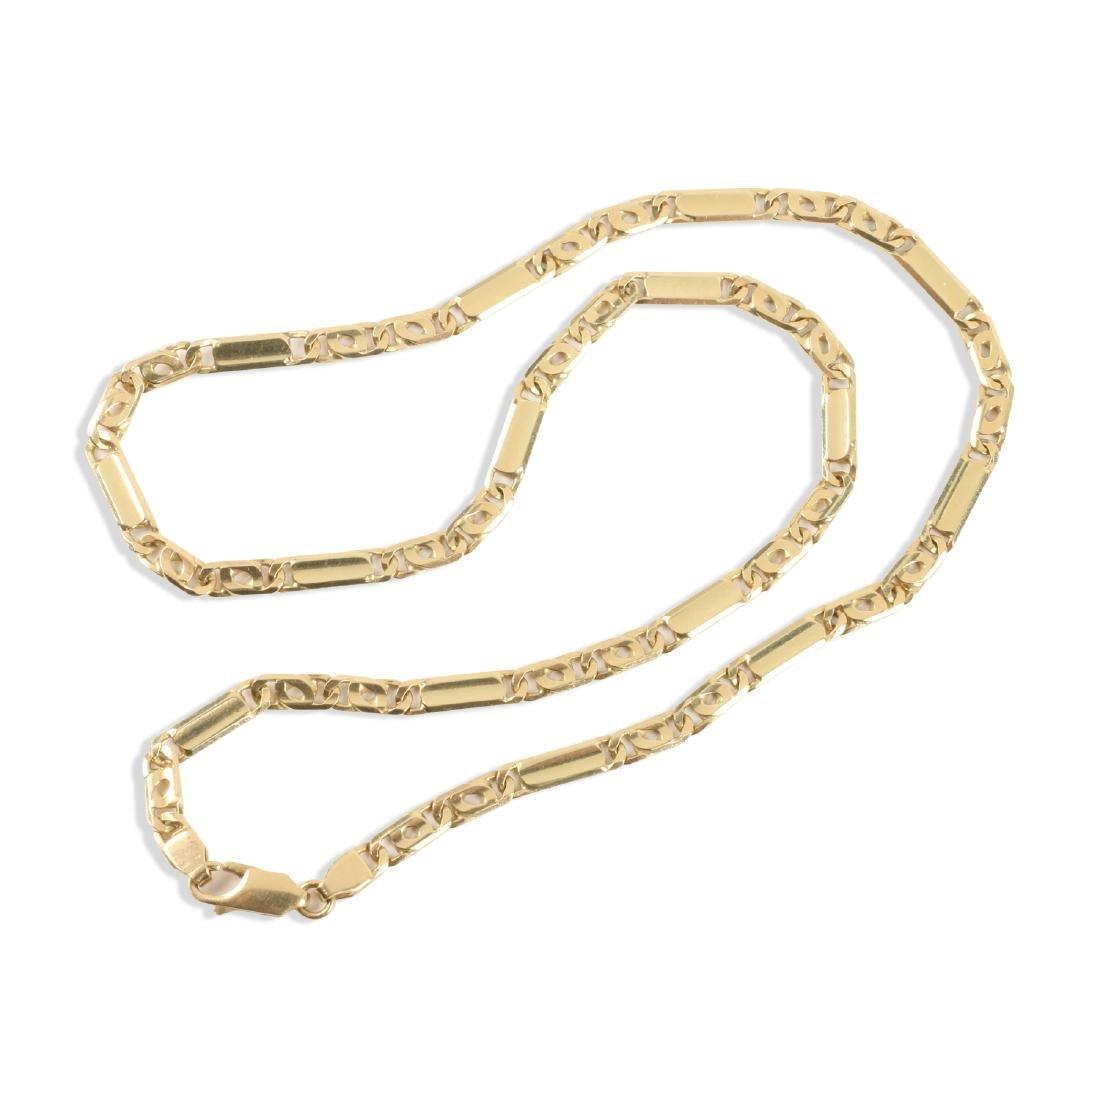 An 18K Gold Chain